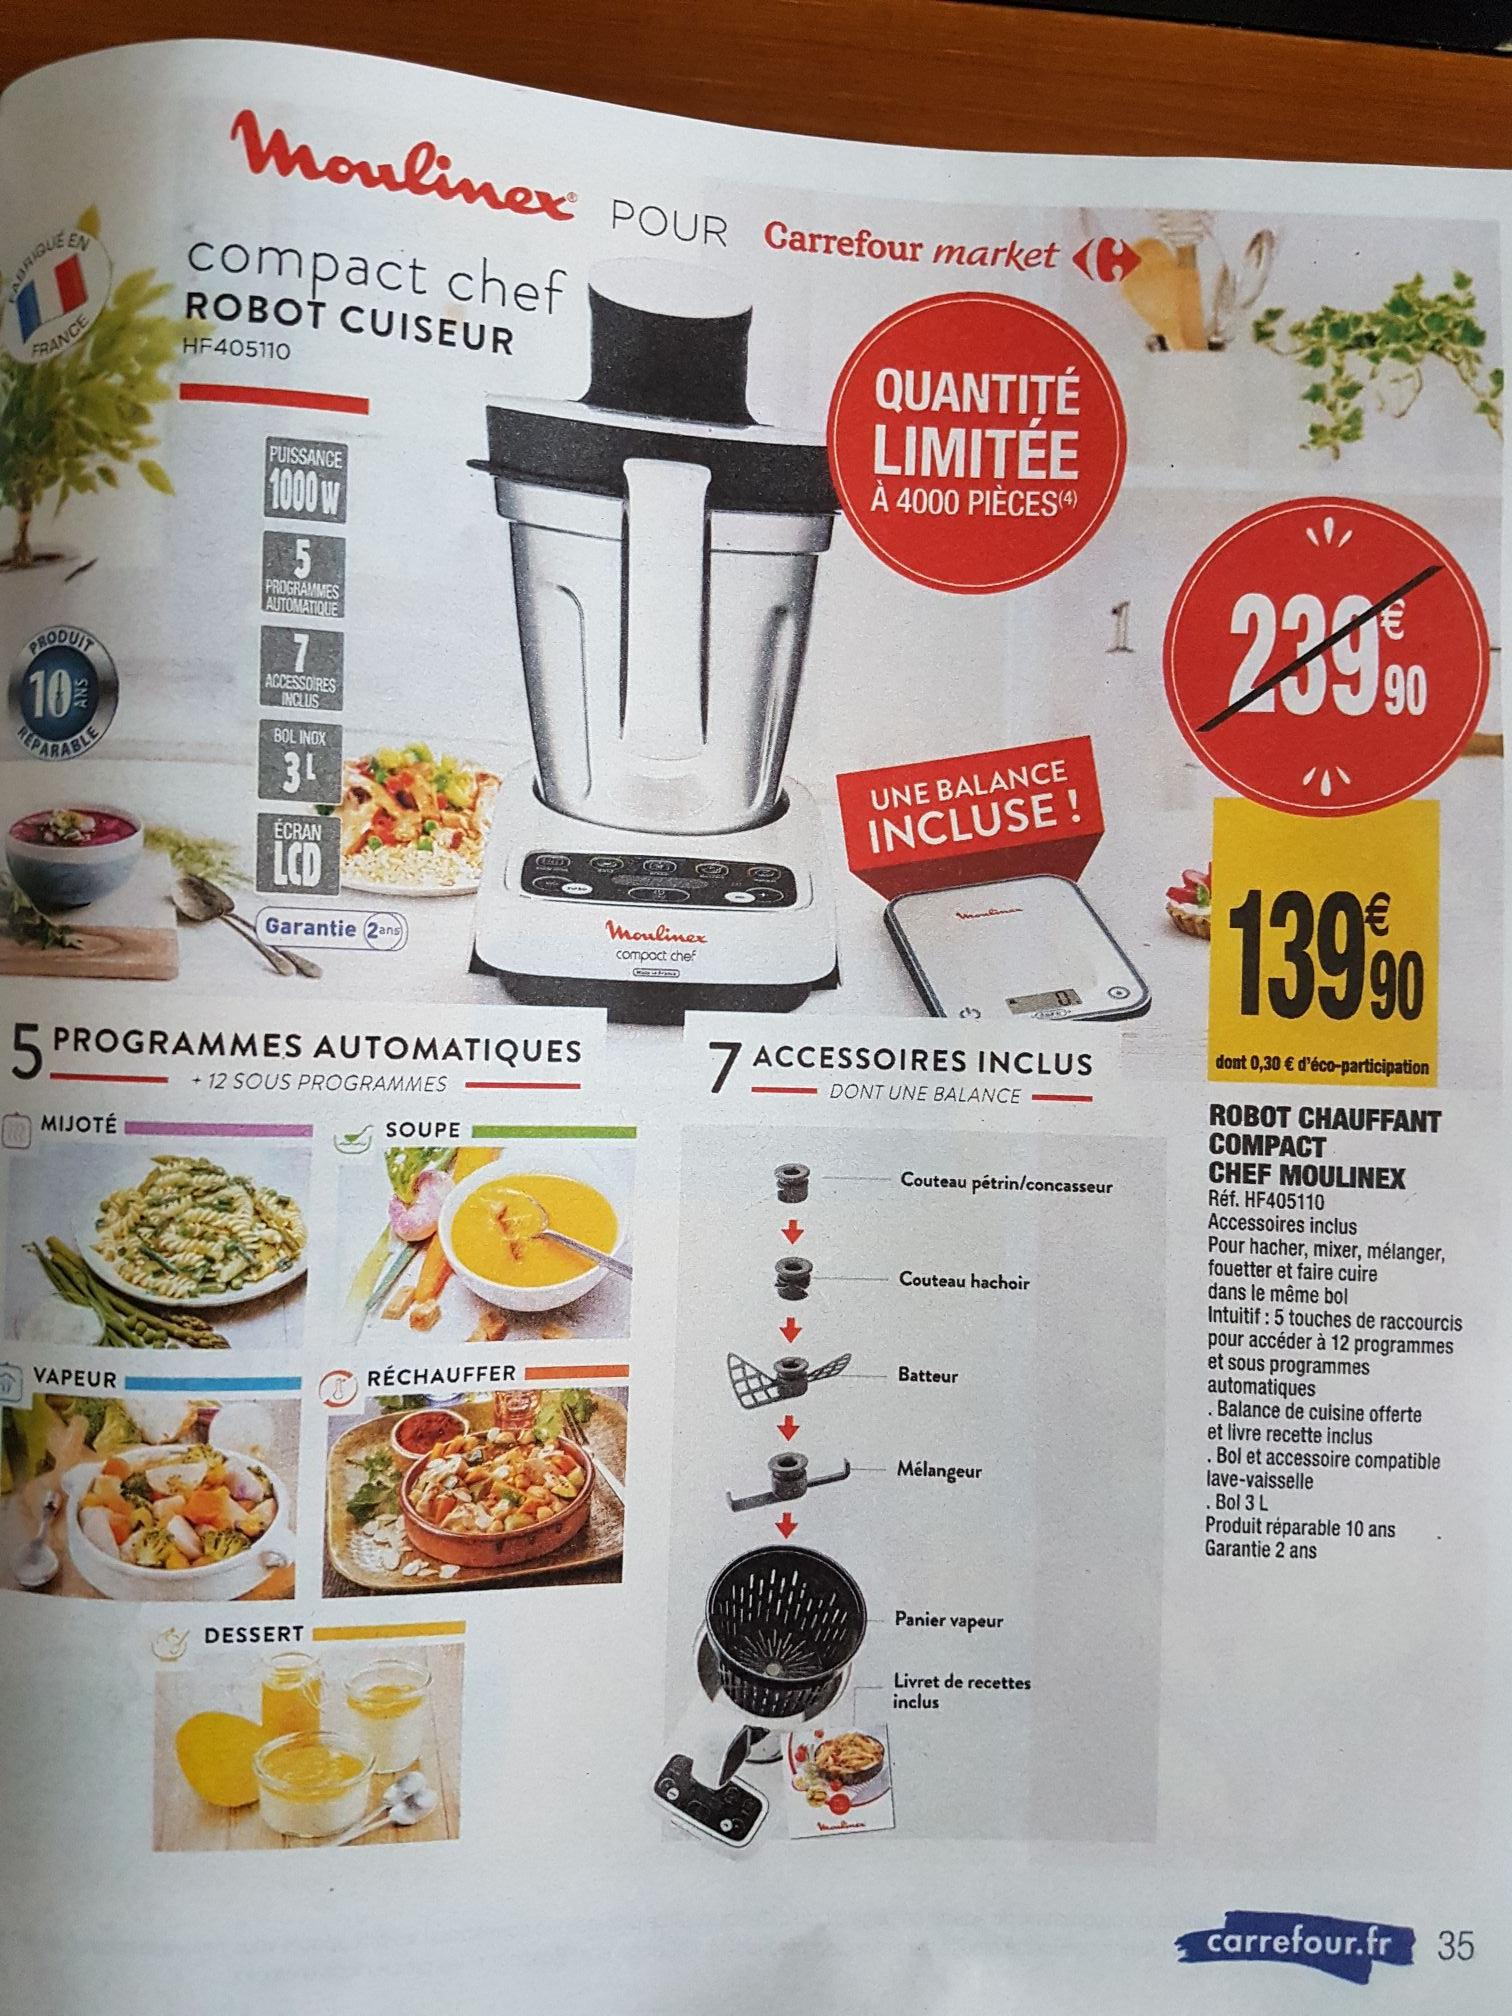 Robot chauffant compact Chef Moulinex HF405110 - 1000W, 3L